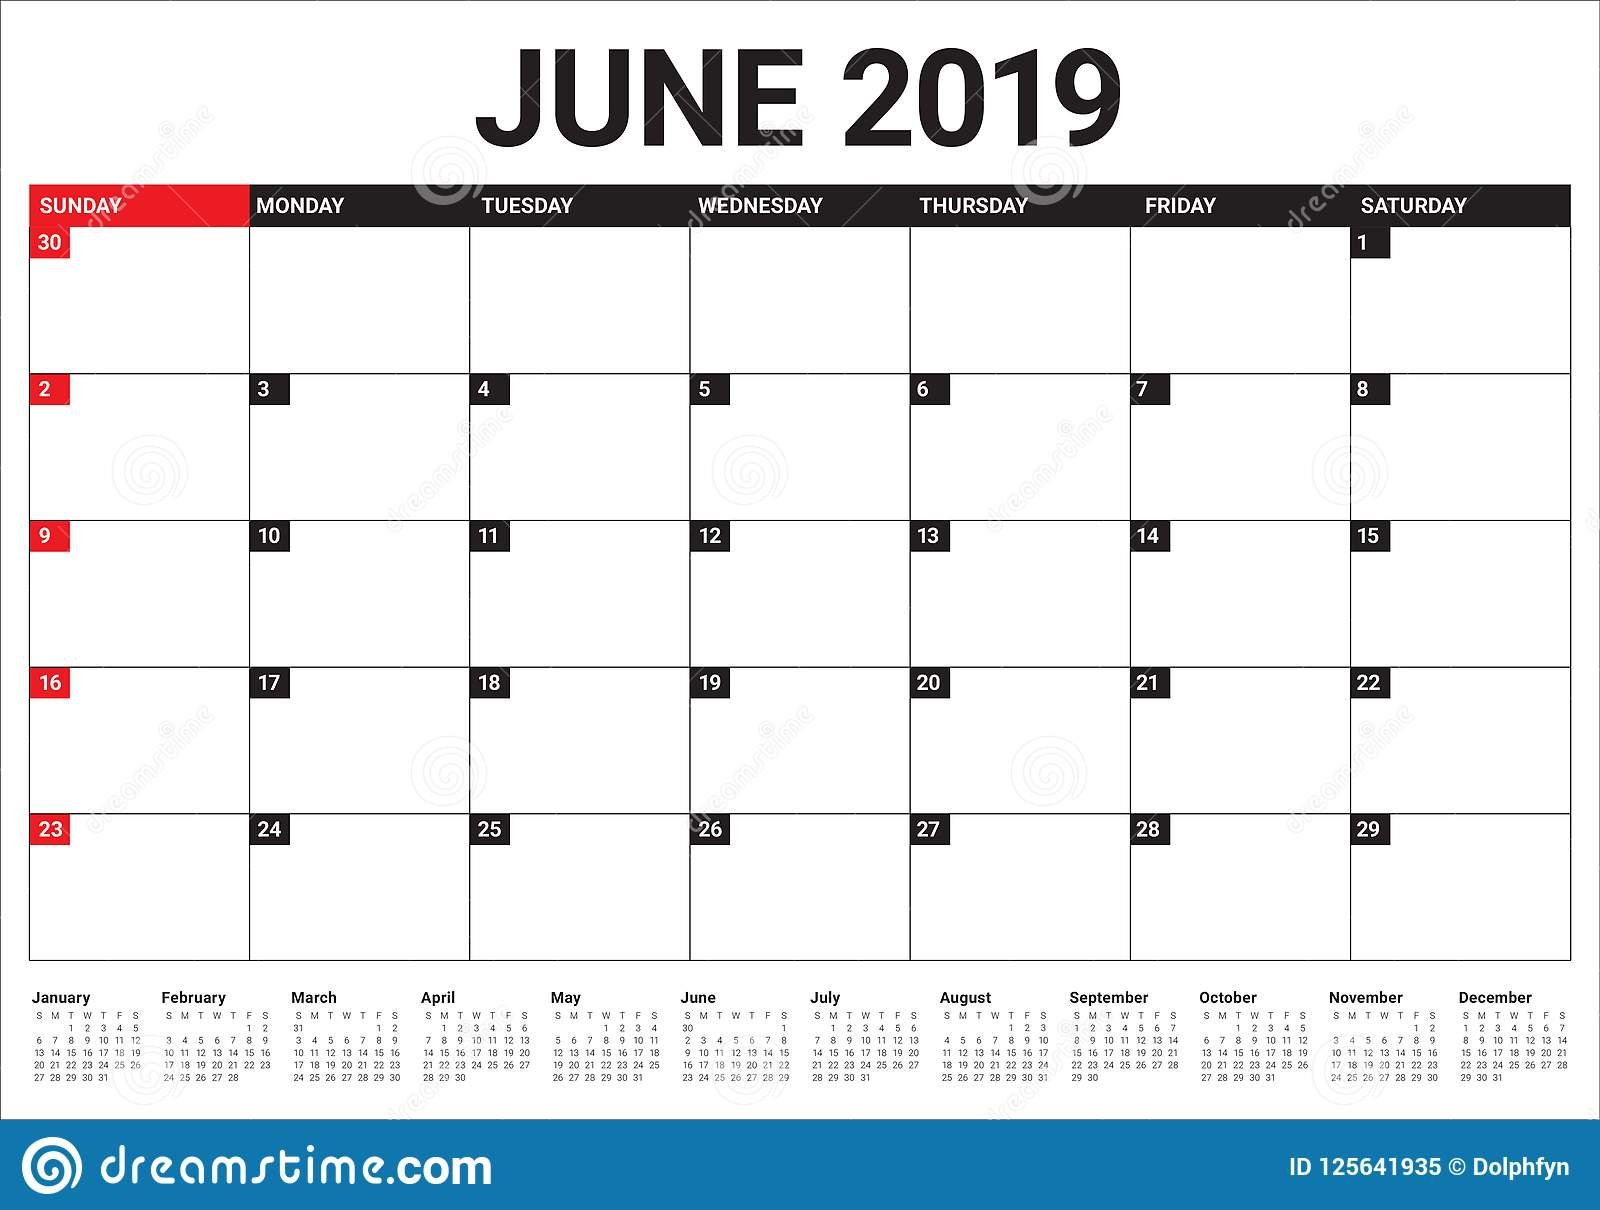 June 2019 Desk Calendar Vector Illustration Stock Vector Calendar 2019 Table